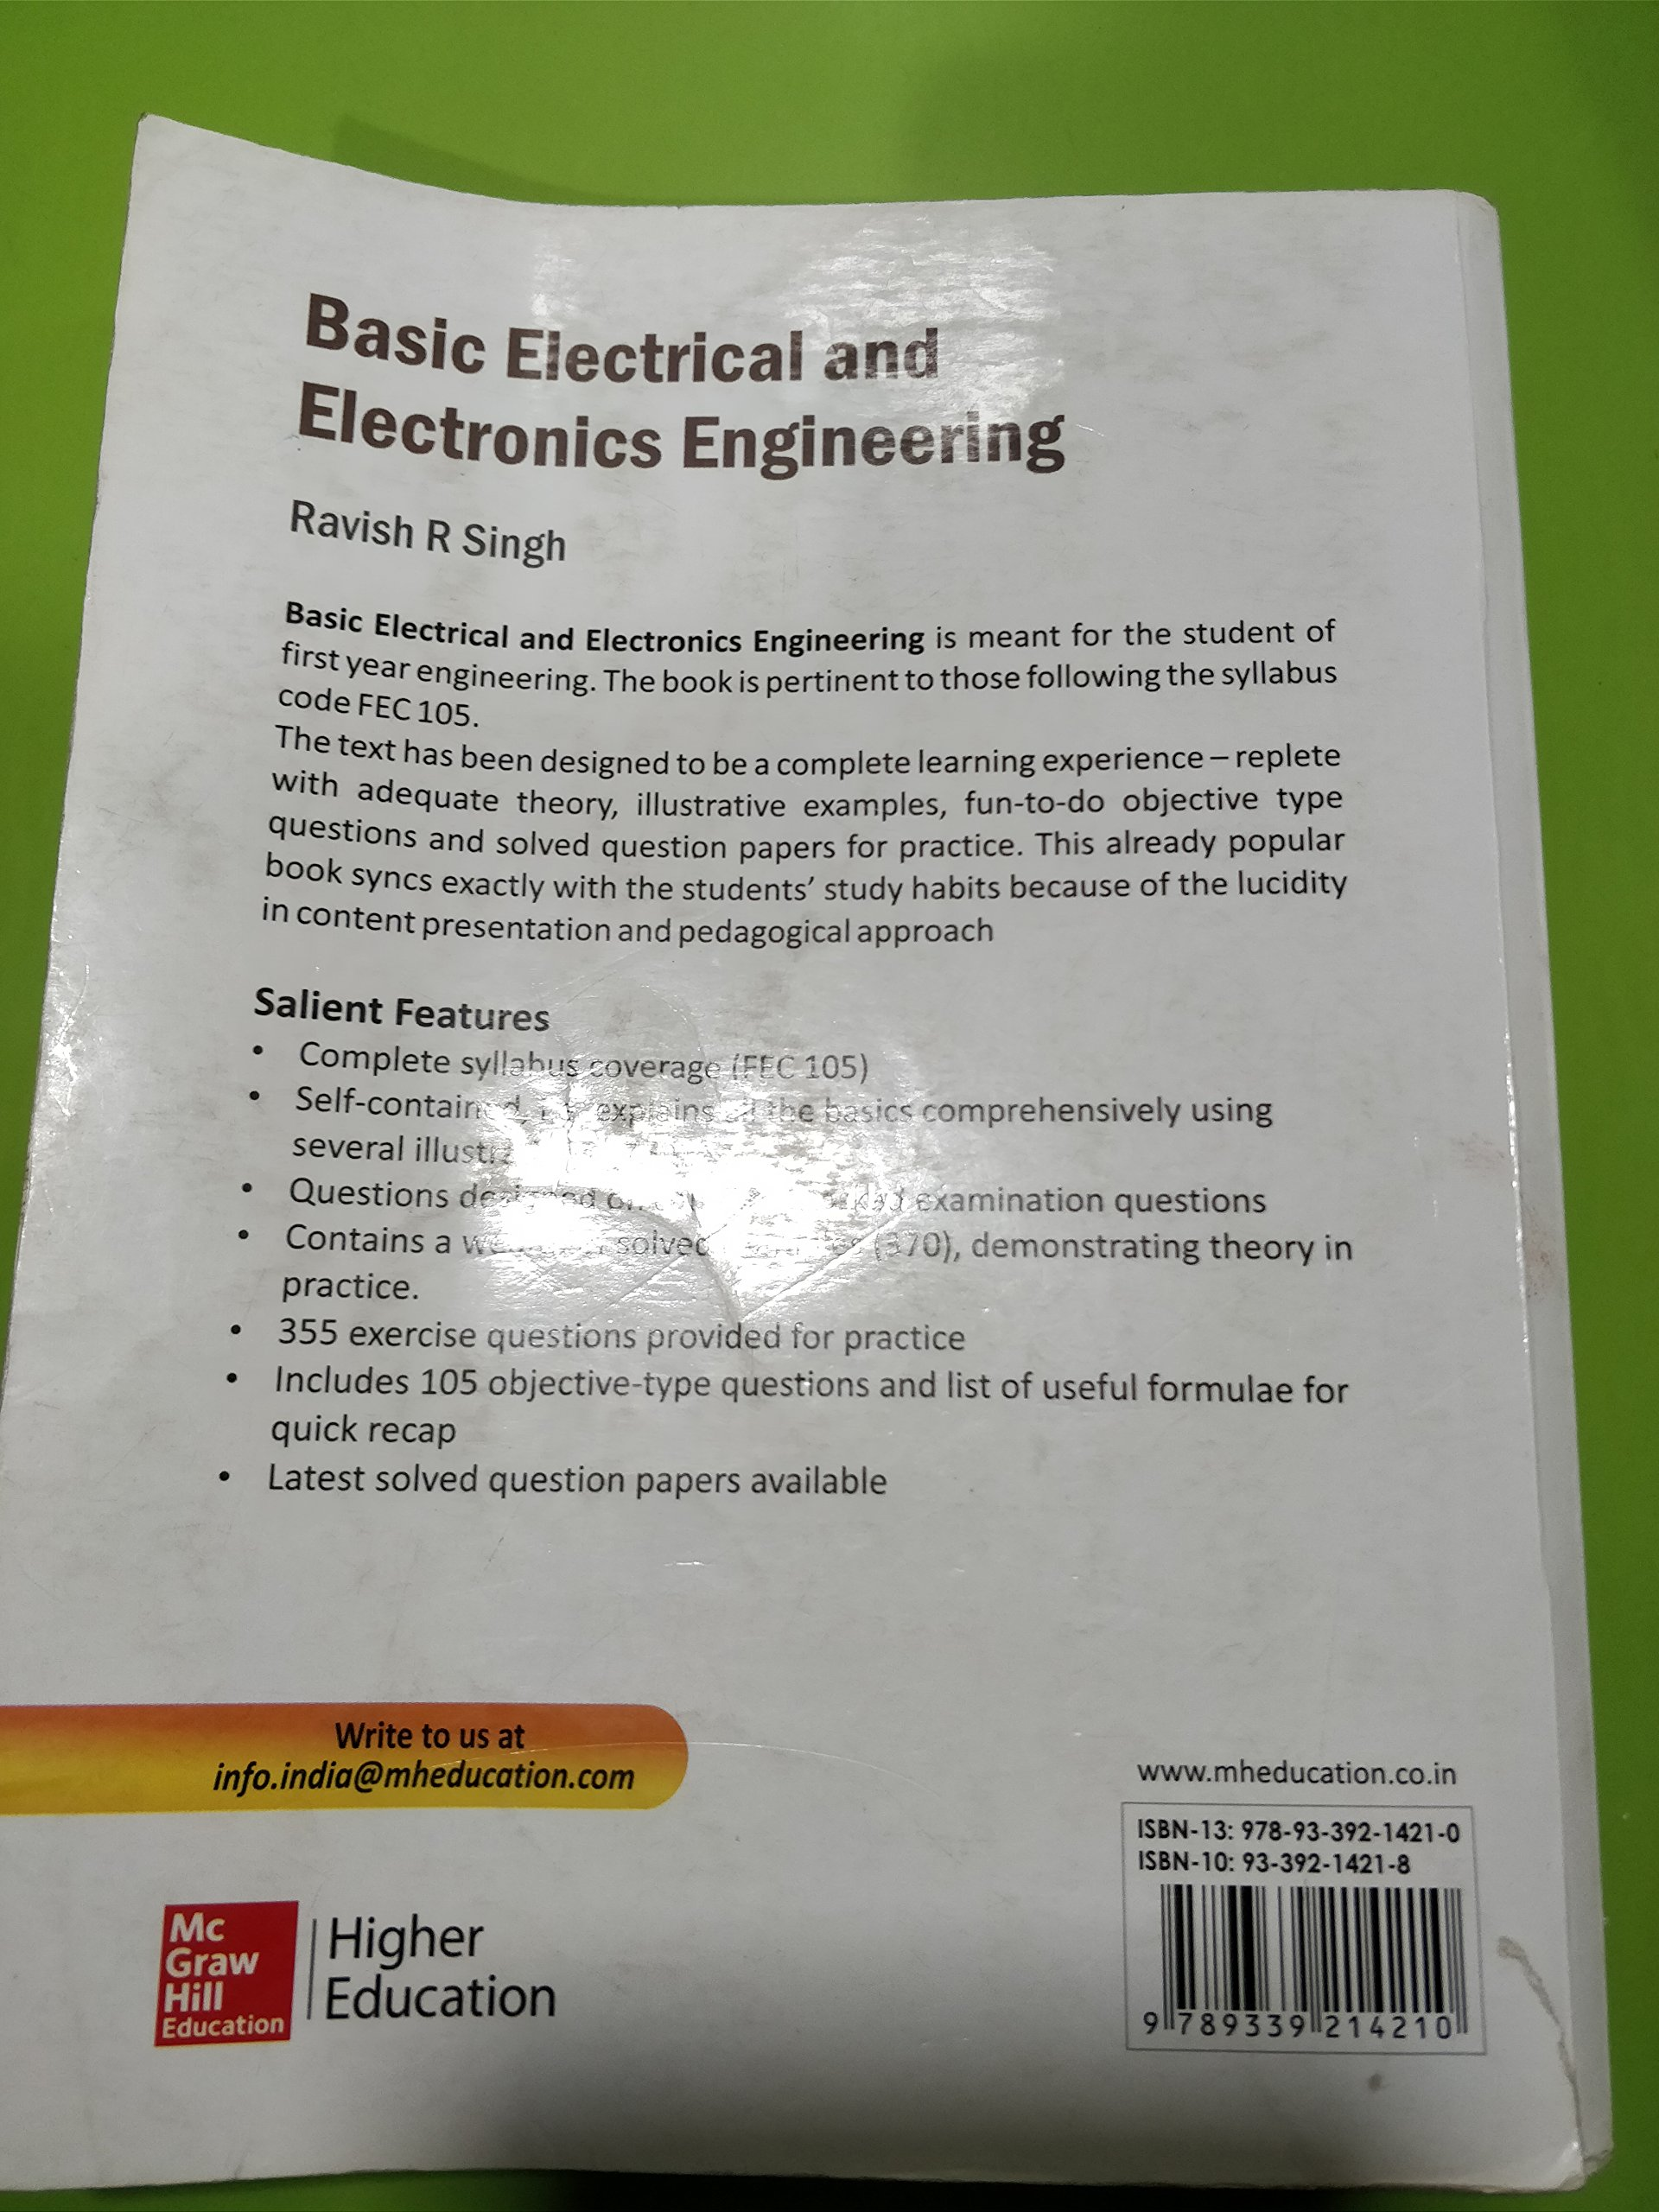 Basic Electrical And Electronics Engineering By Ravish